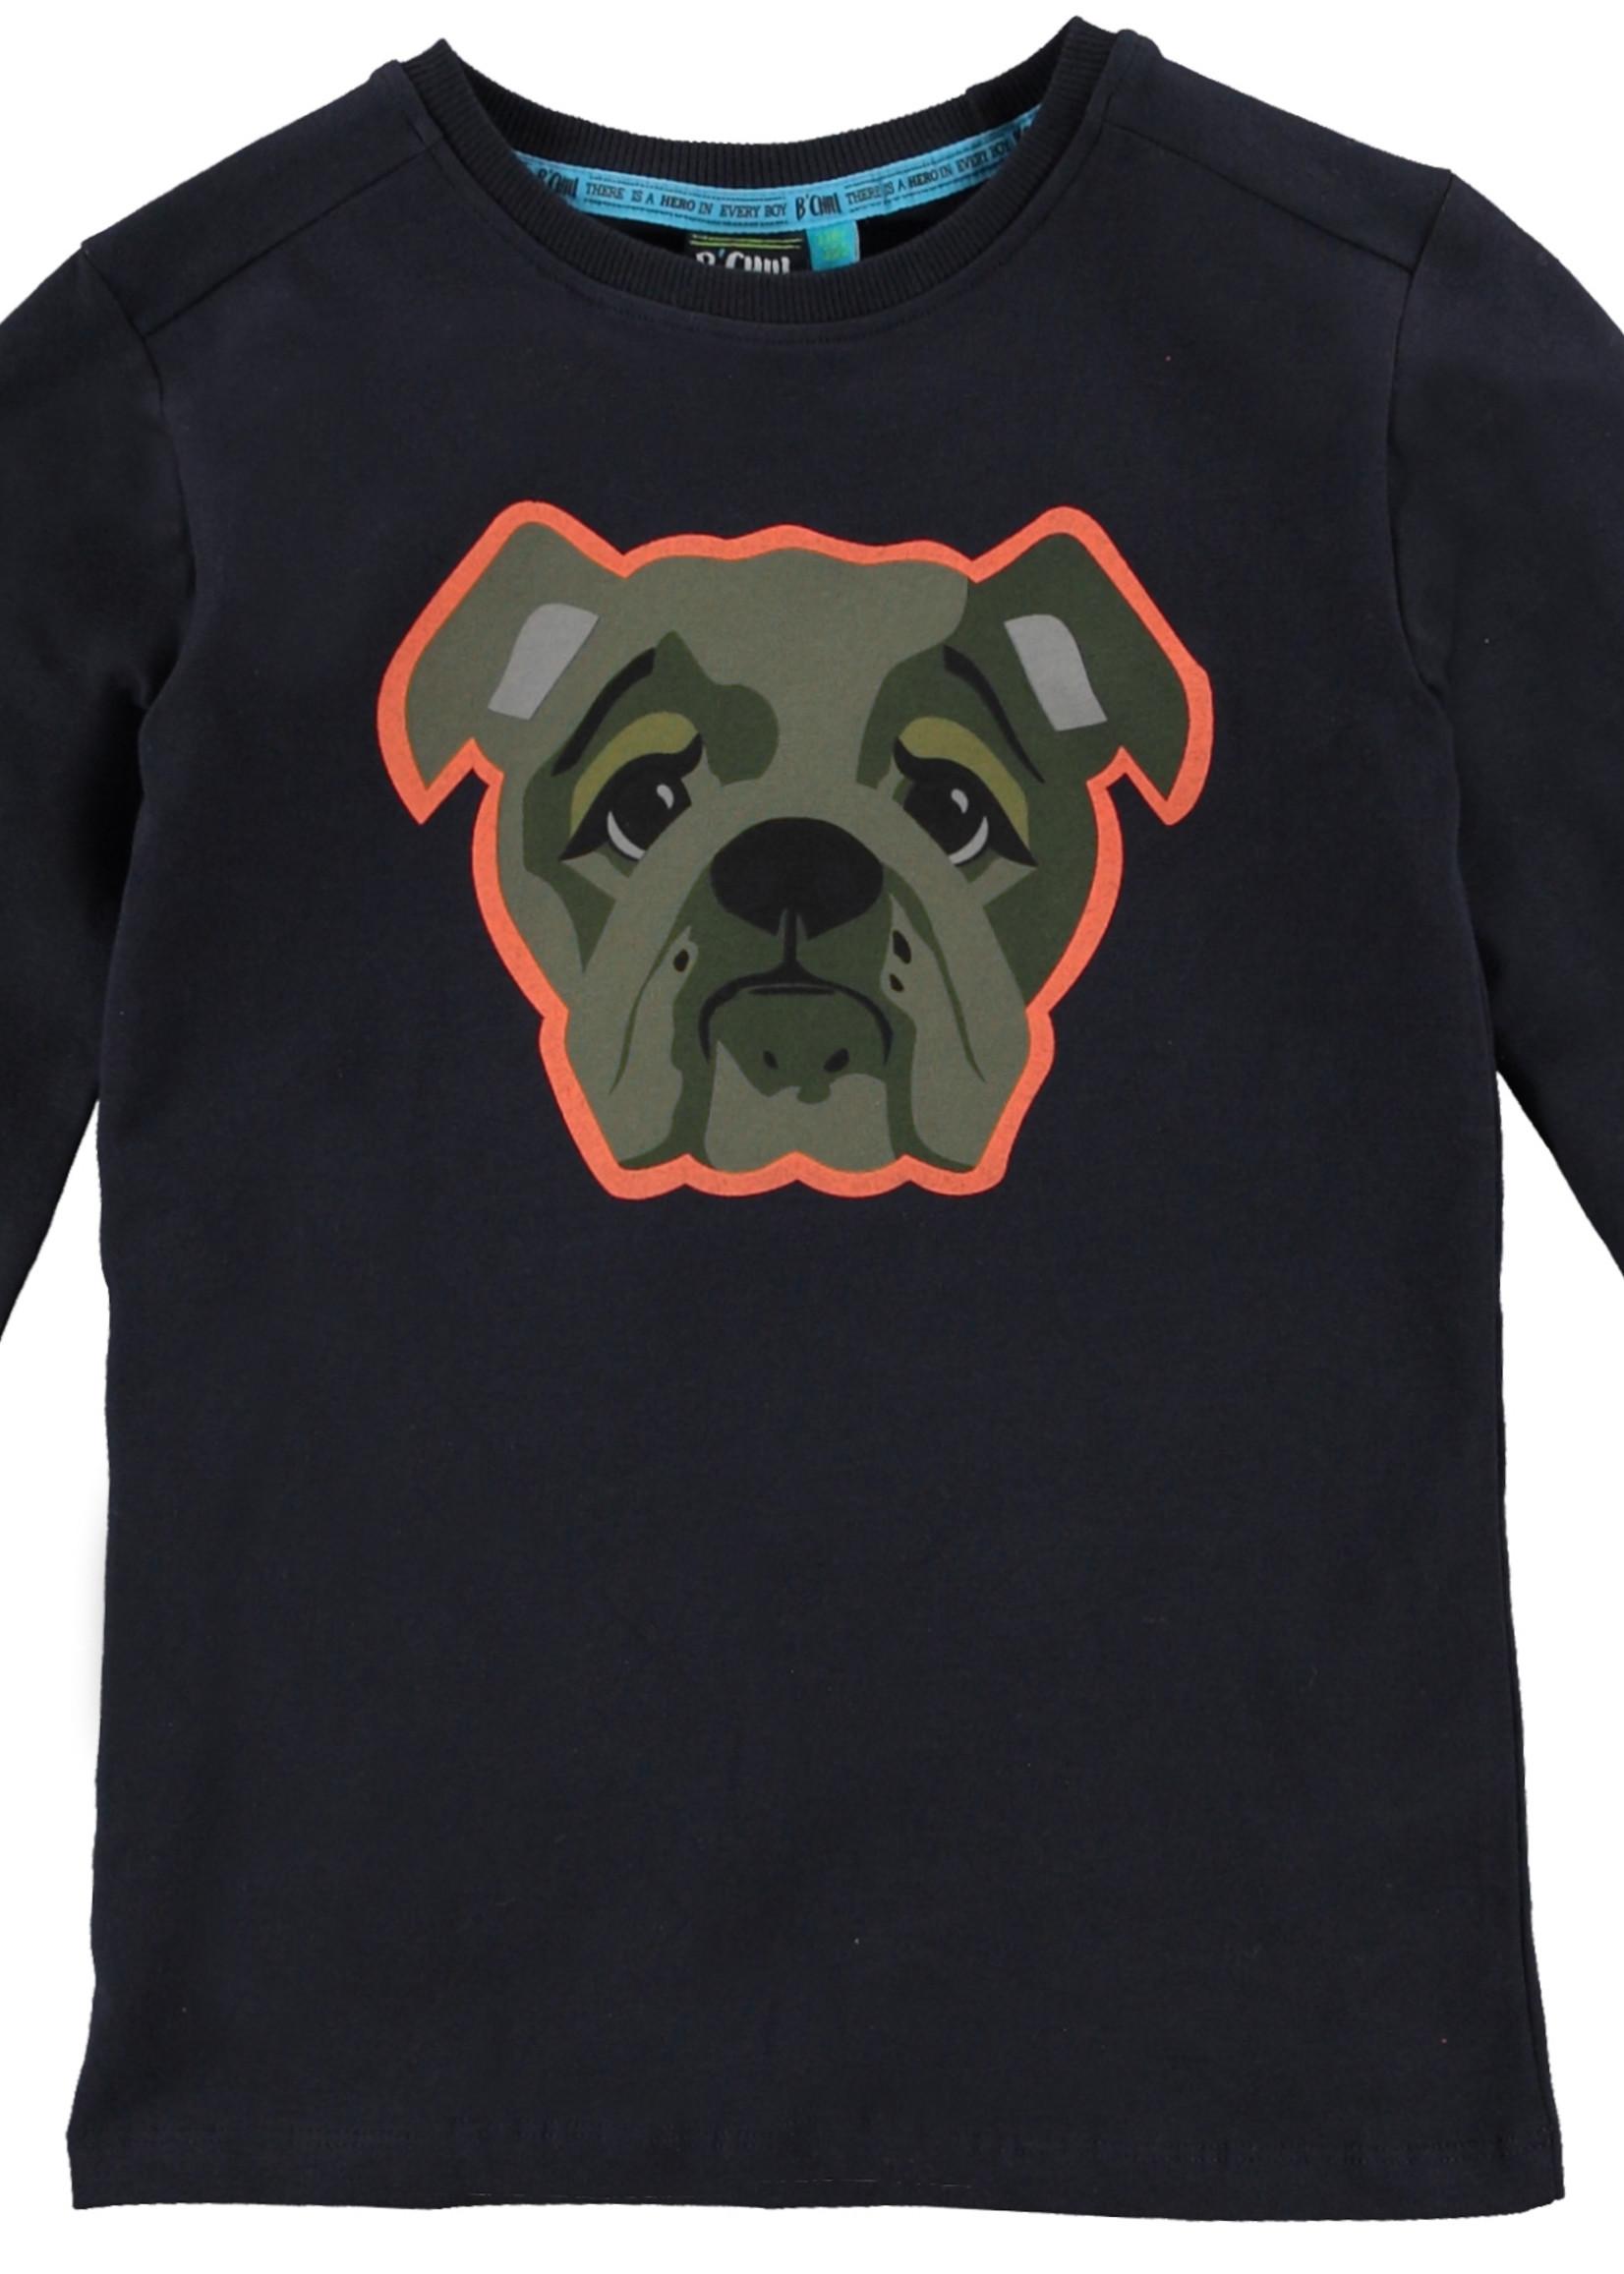 B'chill Denver shirt